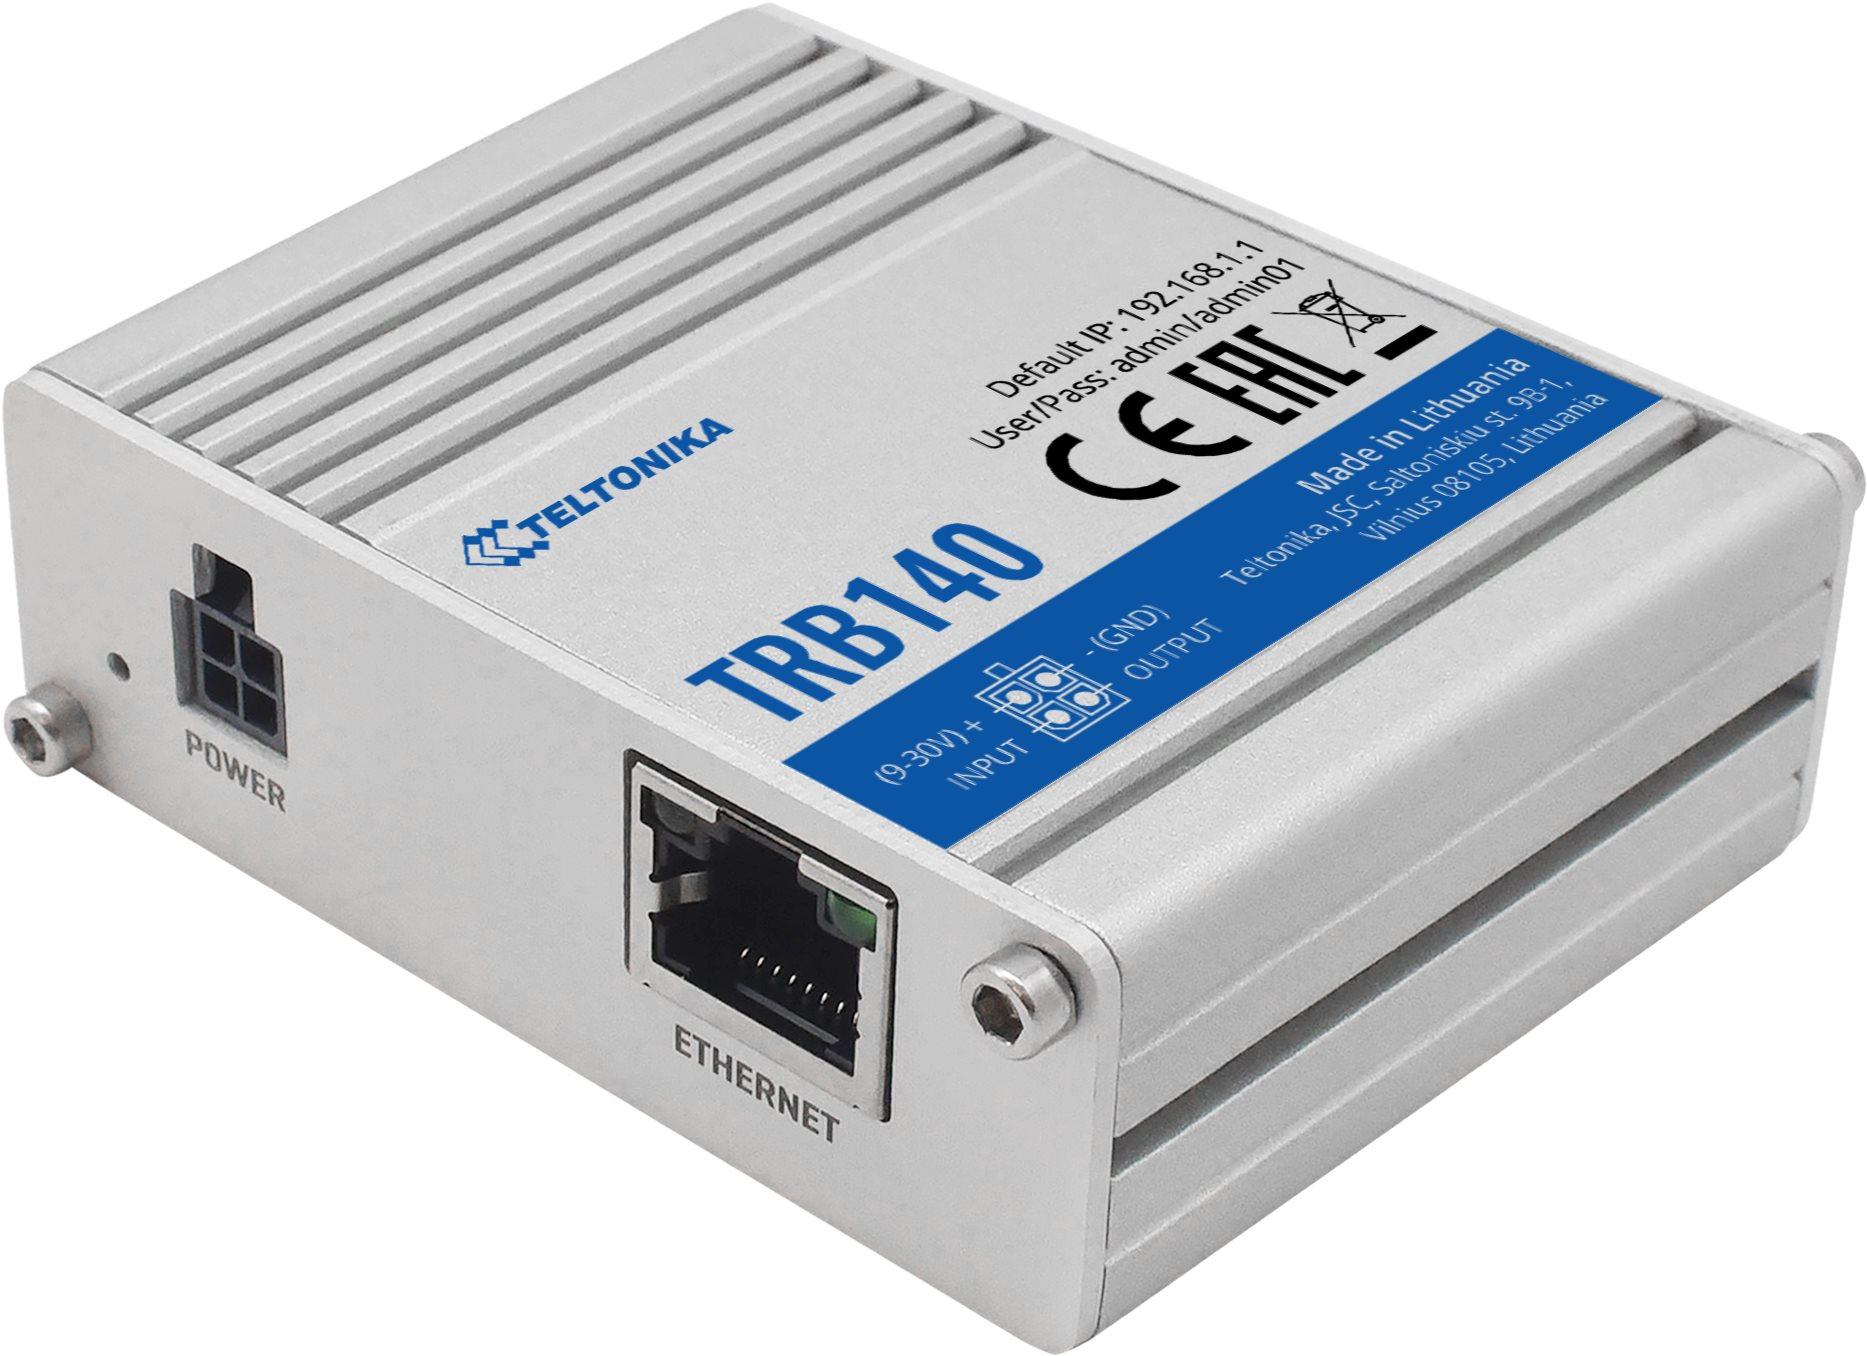 Teltonika LTE Router TRB140